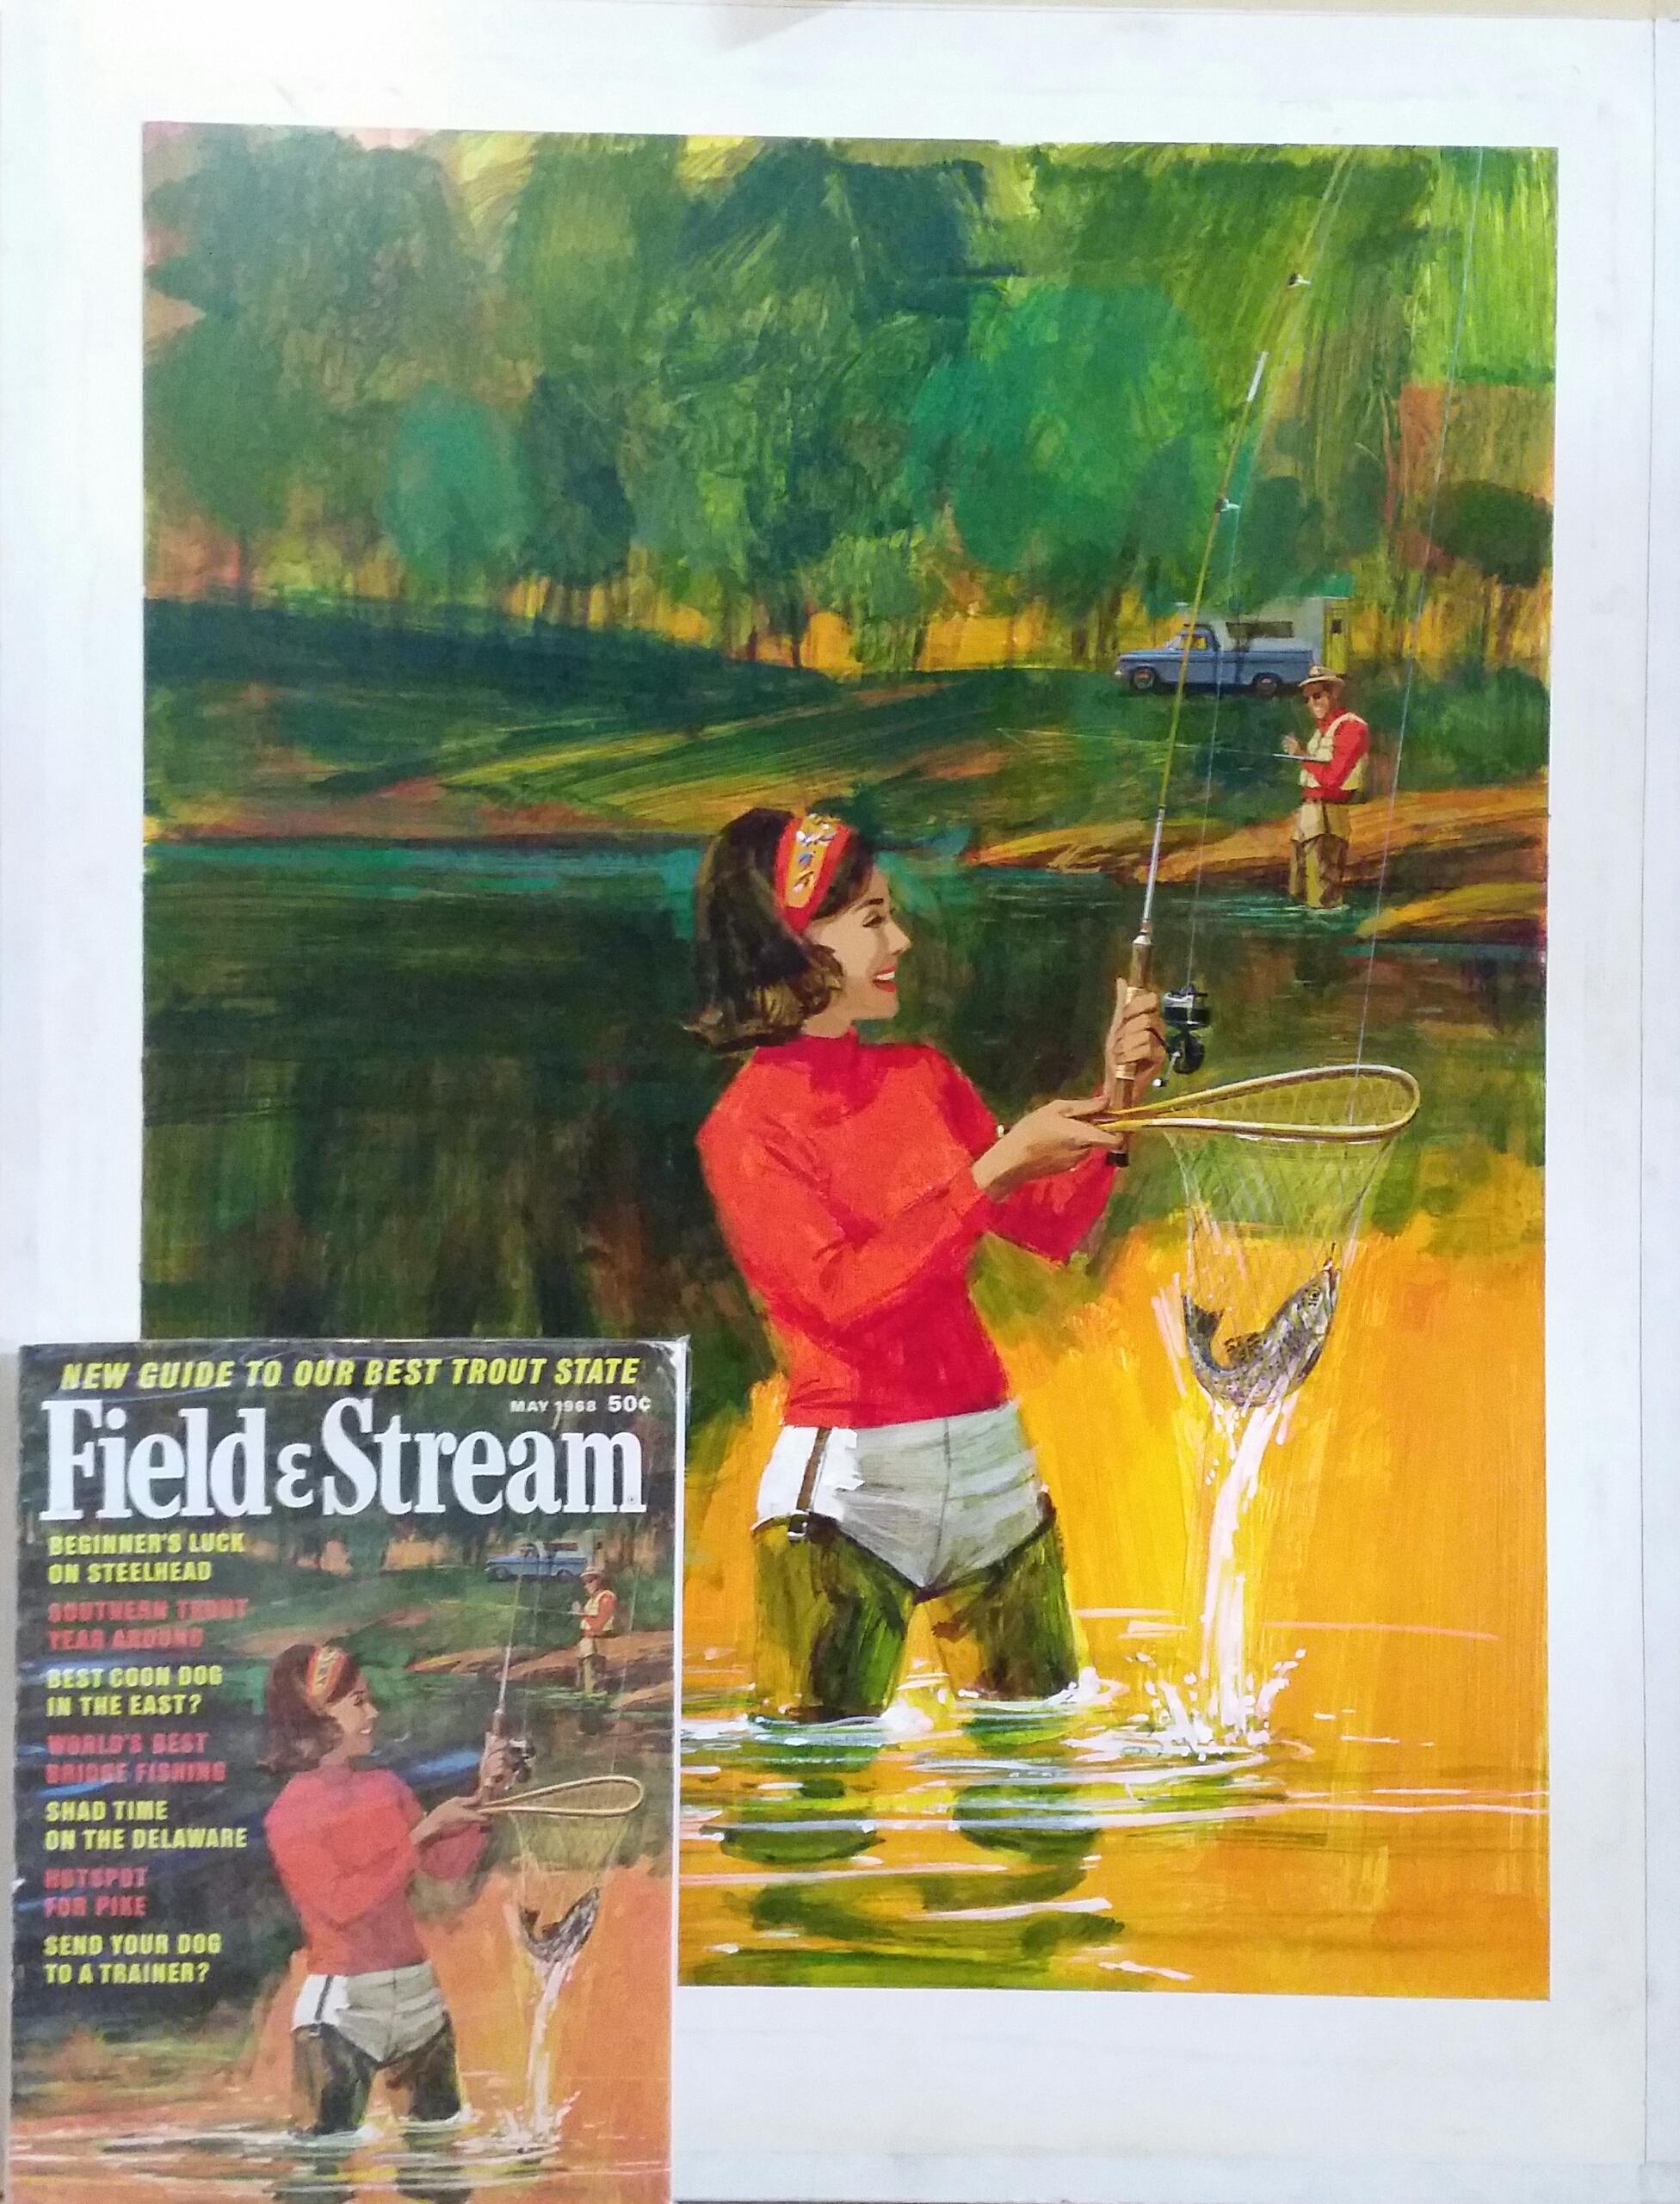 FIELD&STREAM COVER ILLUSTRATION